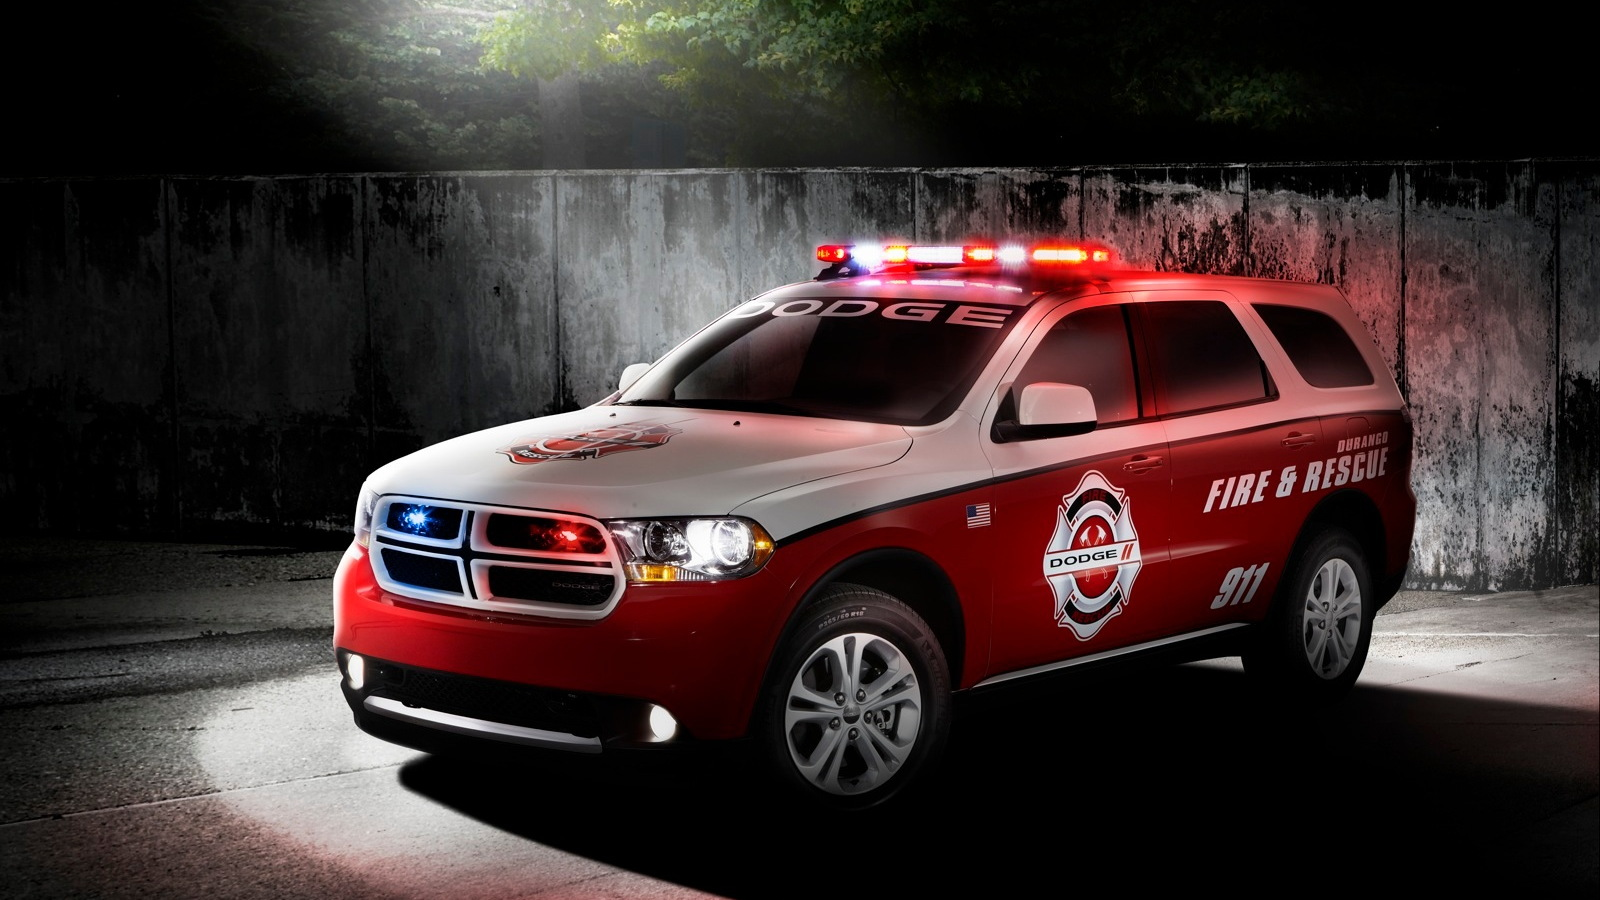 The Dodge Durango Special Service